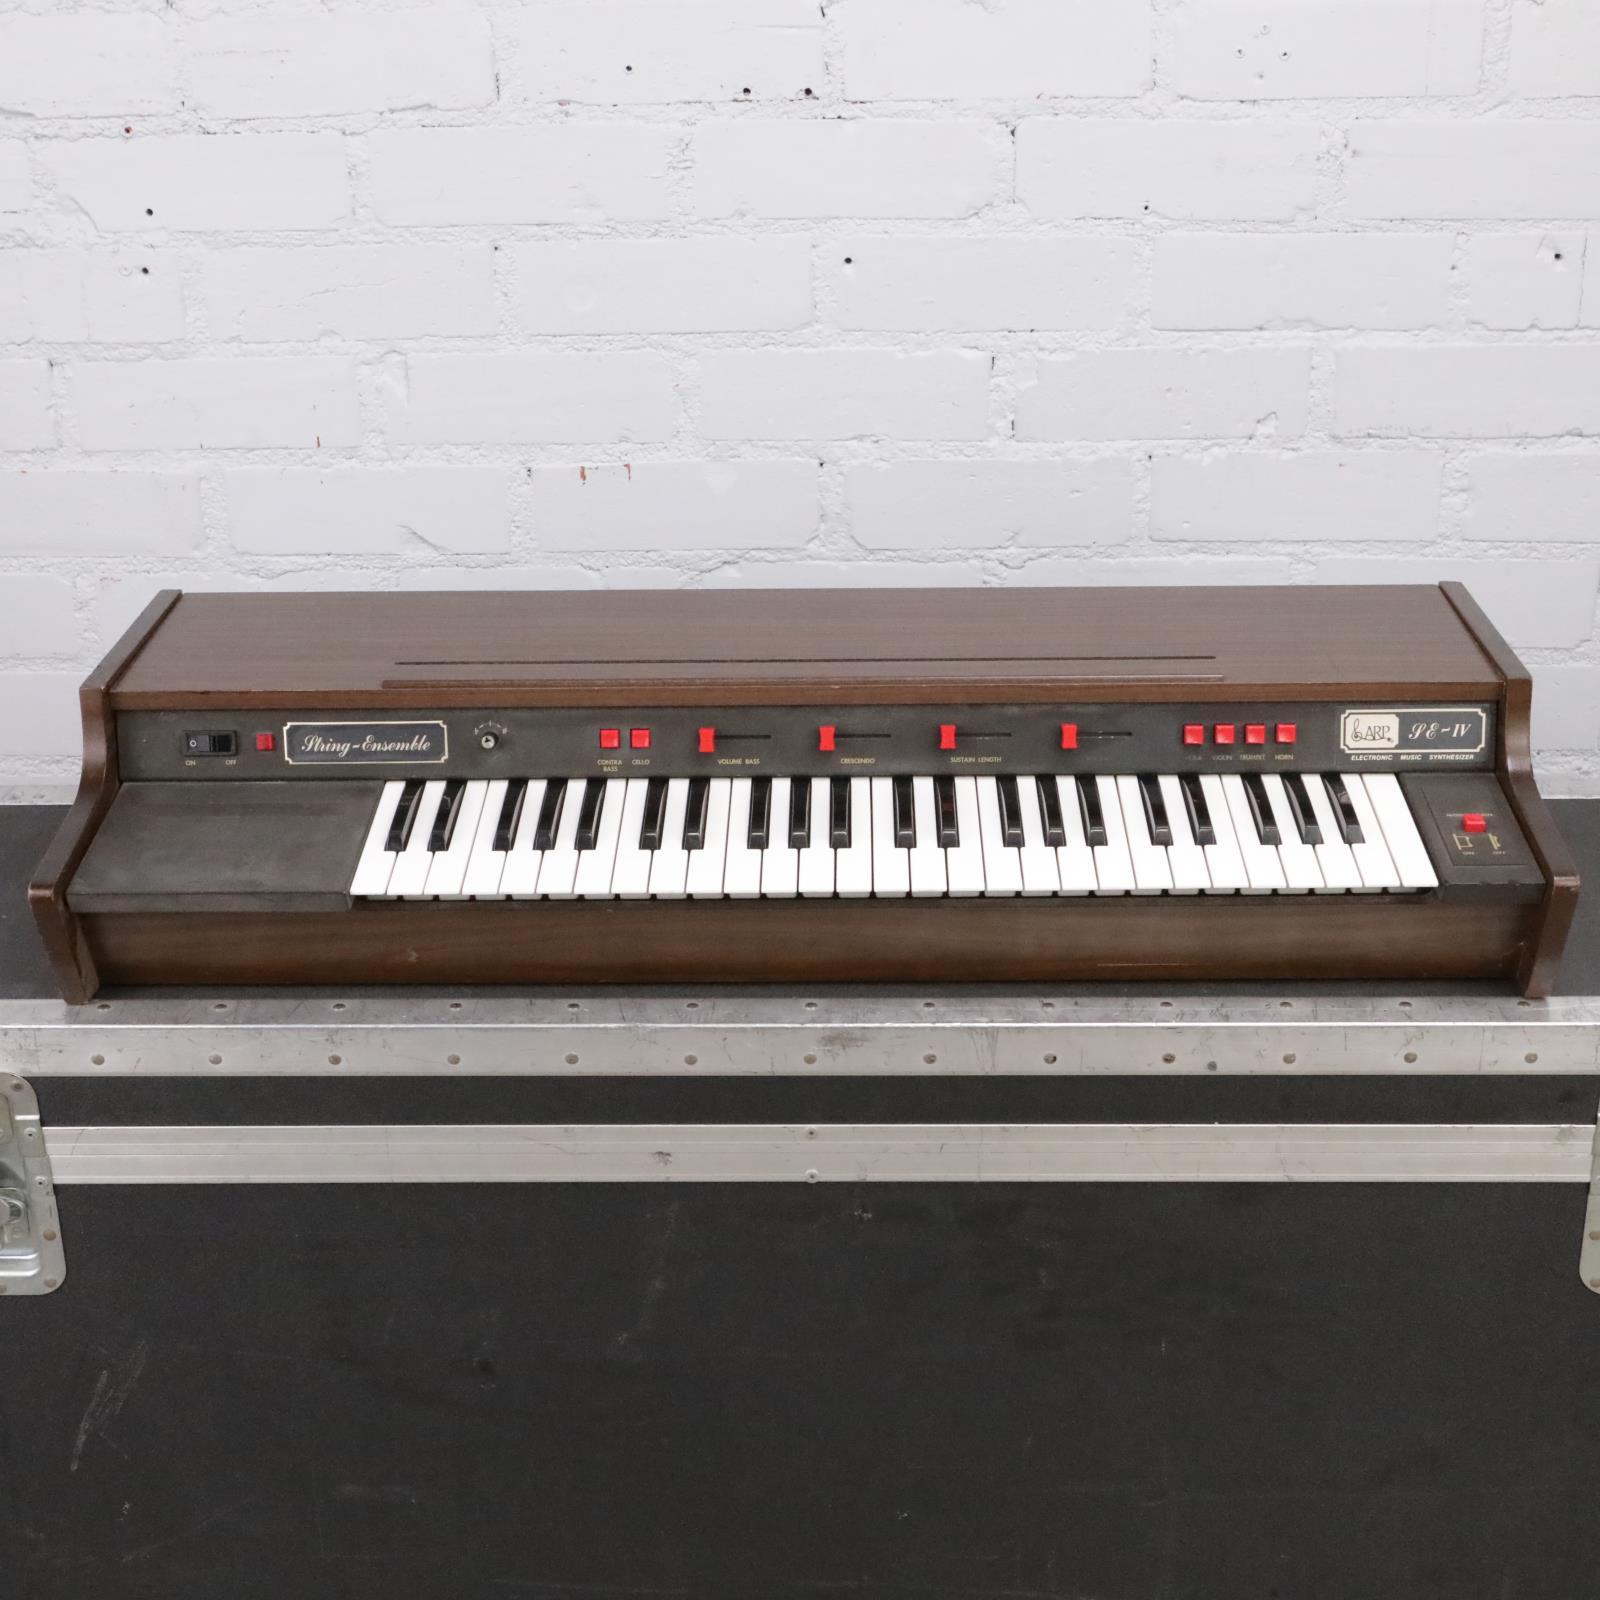 ARP PE-IV Solina String-Ensemble Synthesizer Keyboard #44020